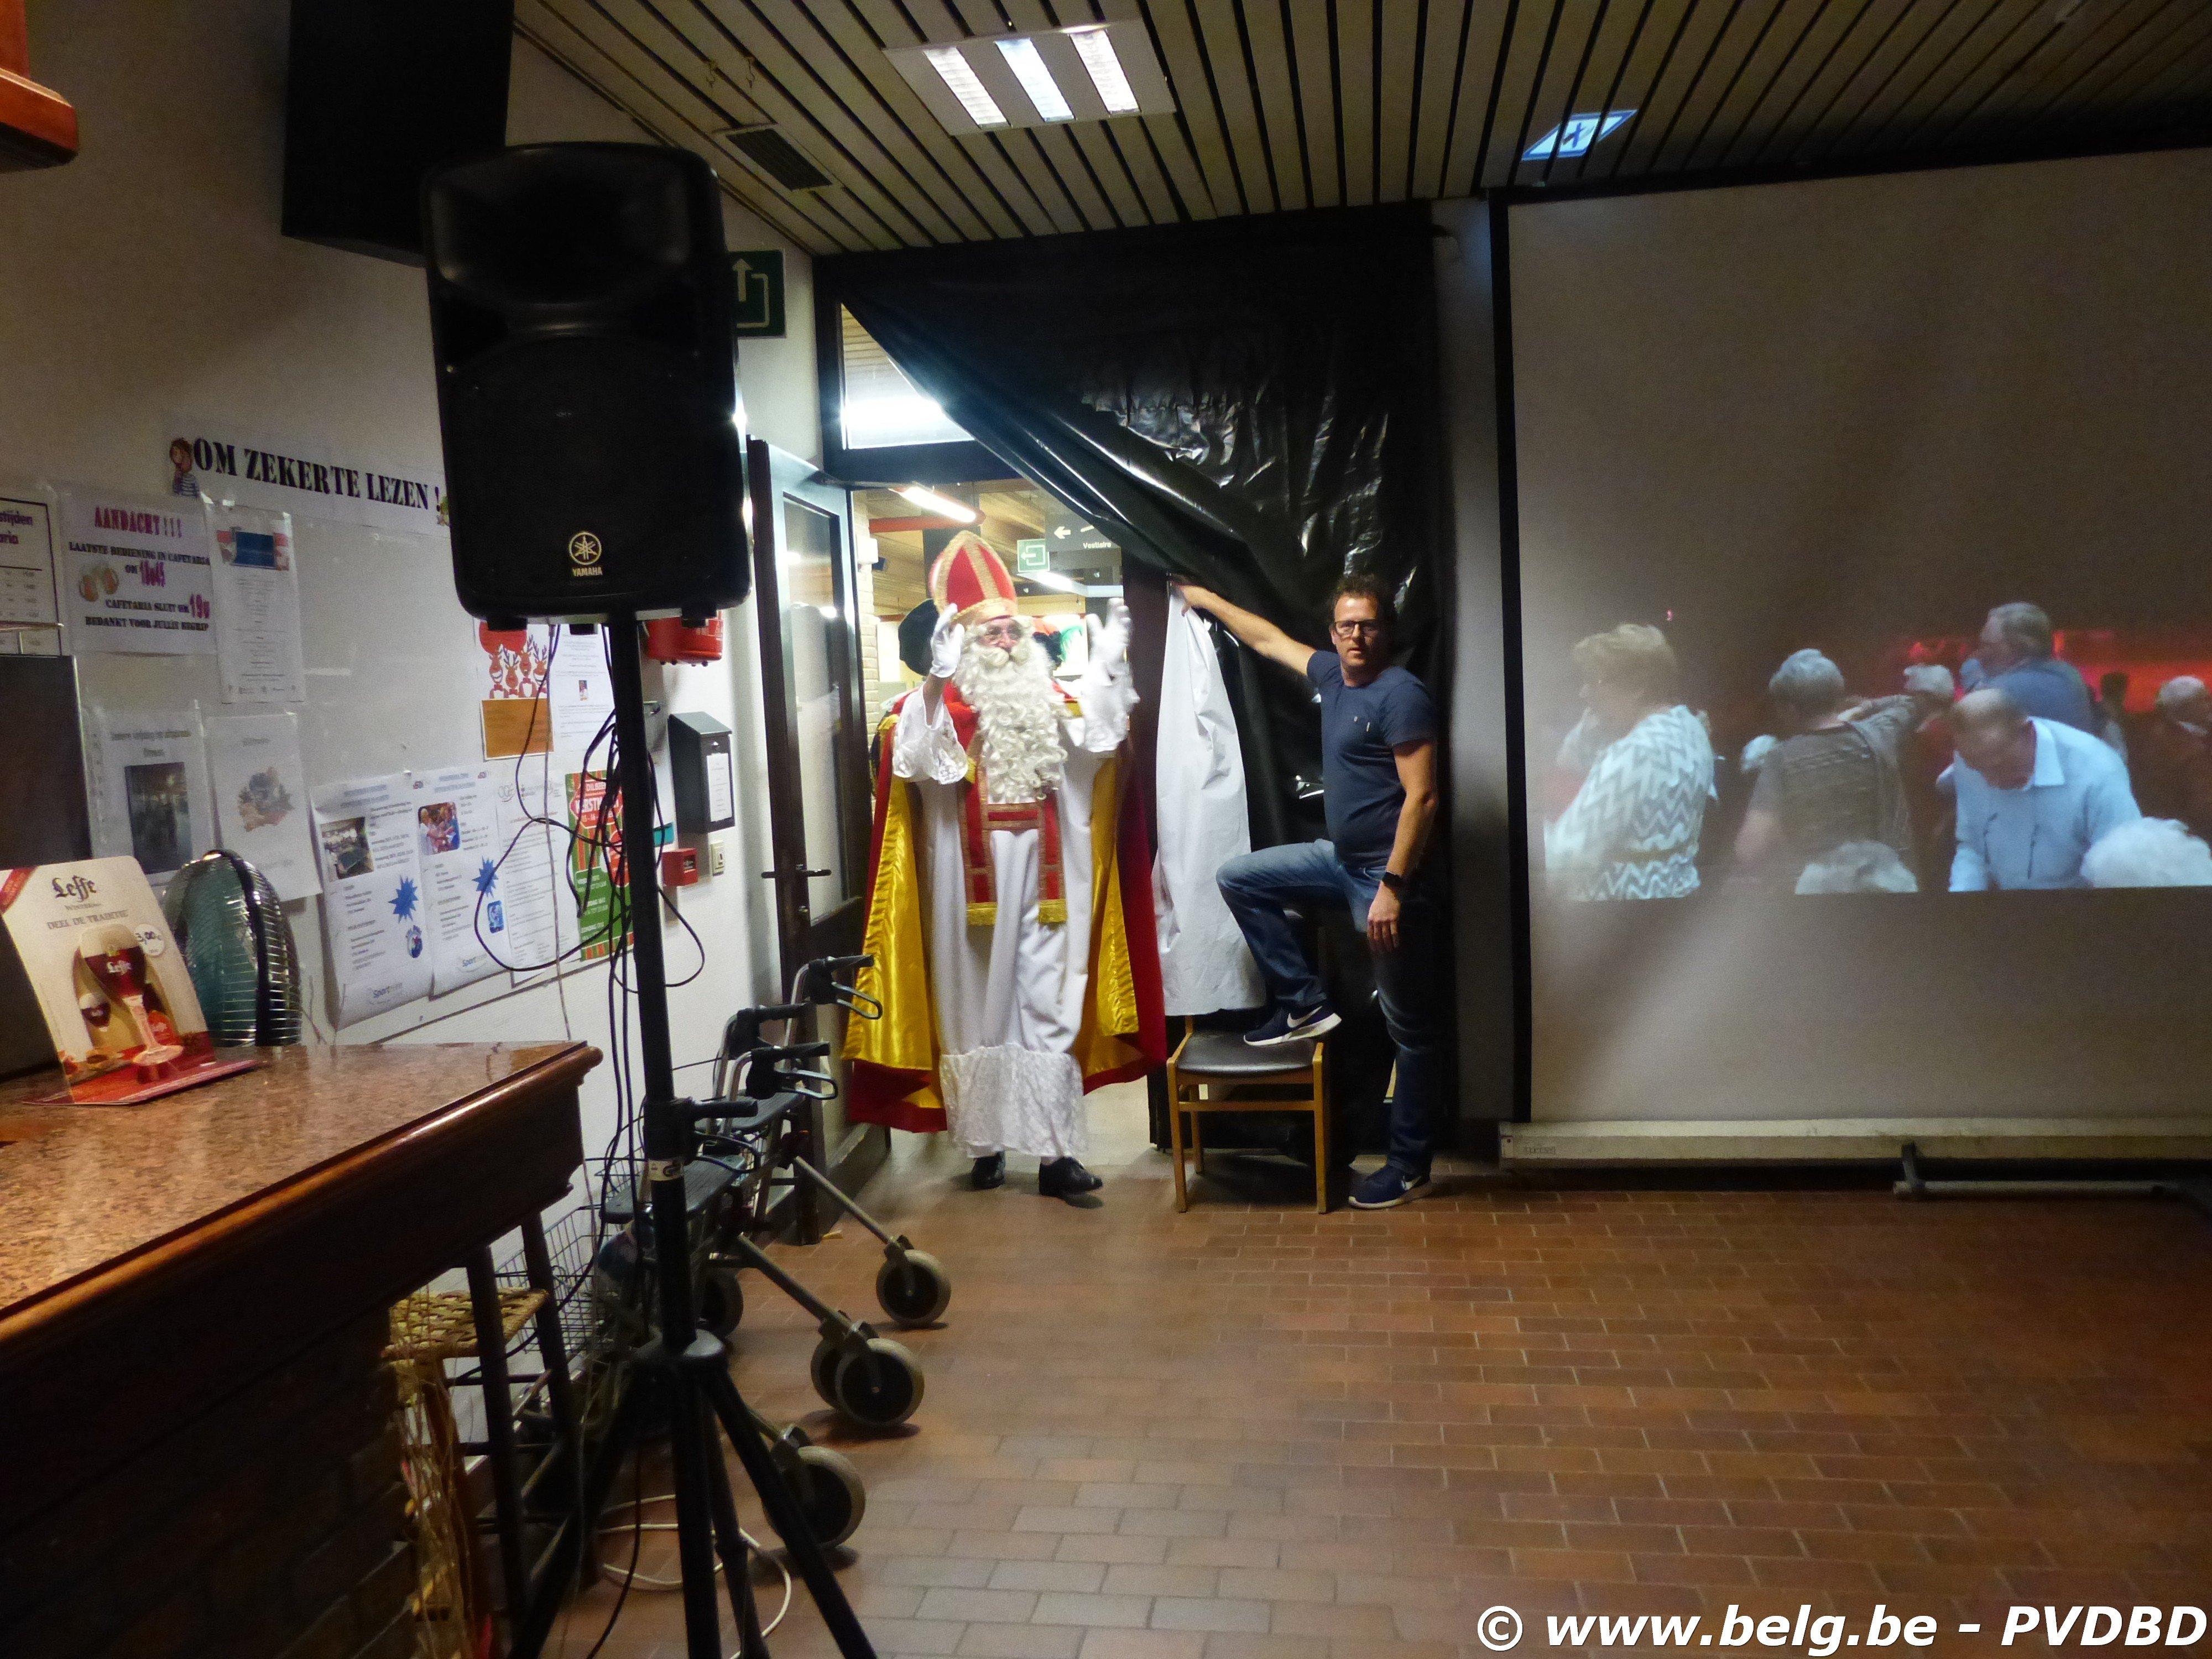 Sint vergeet Dilbeekse senioren niet - P1110942